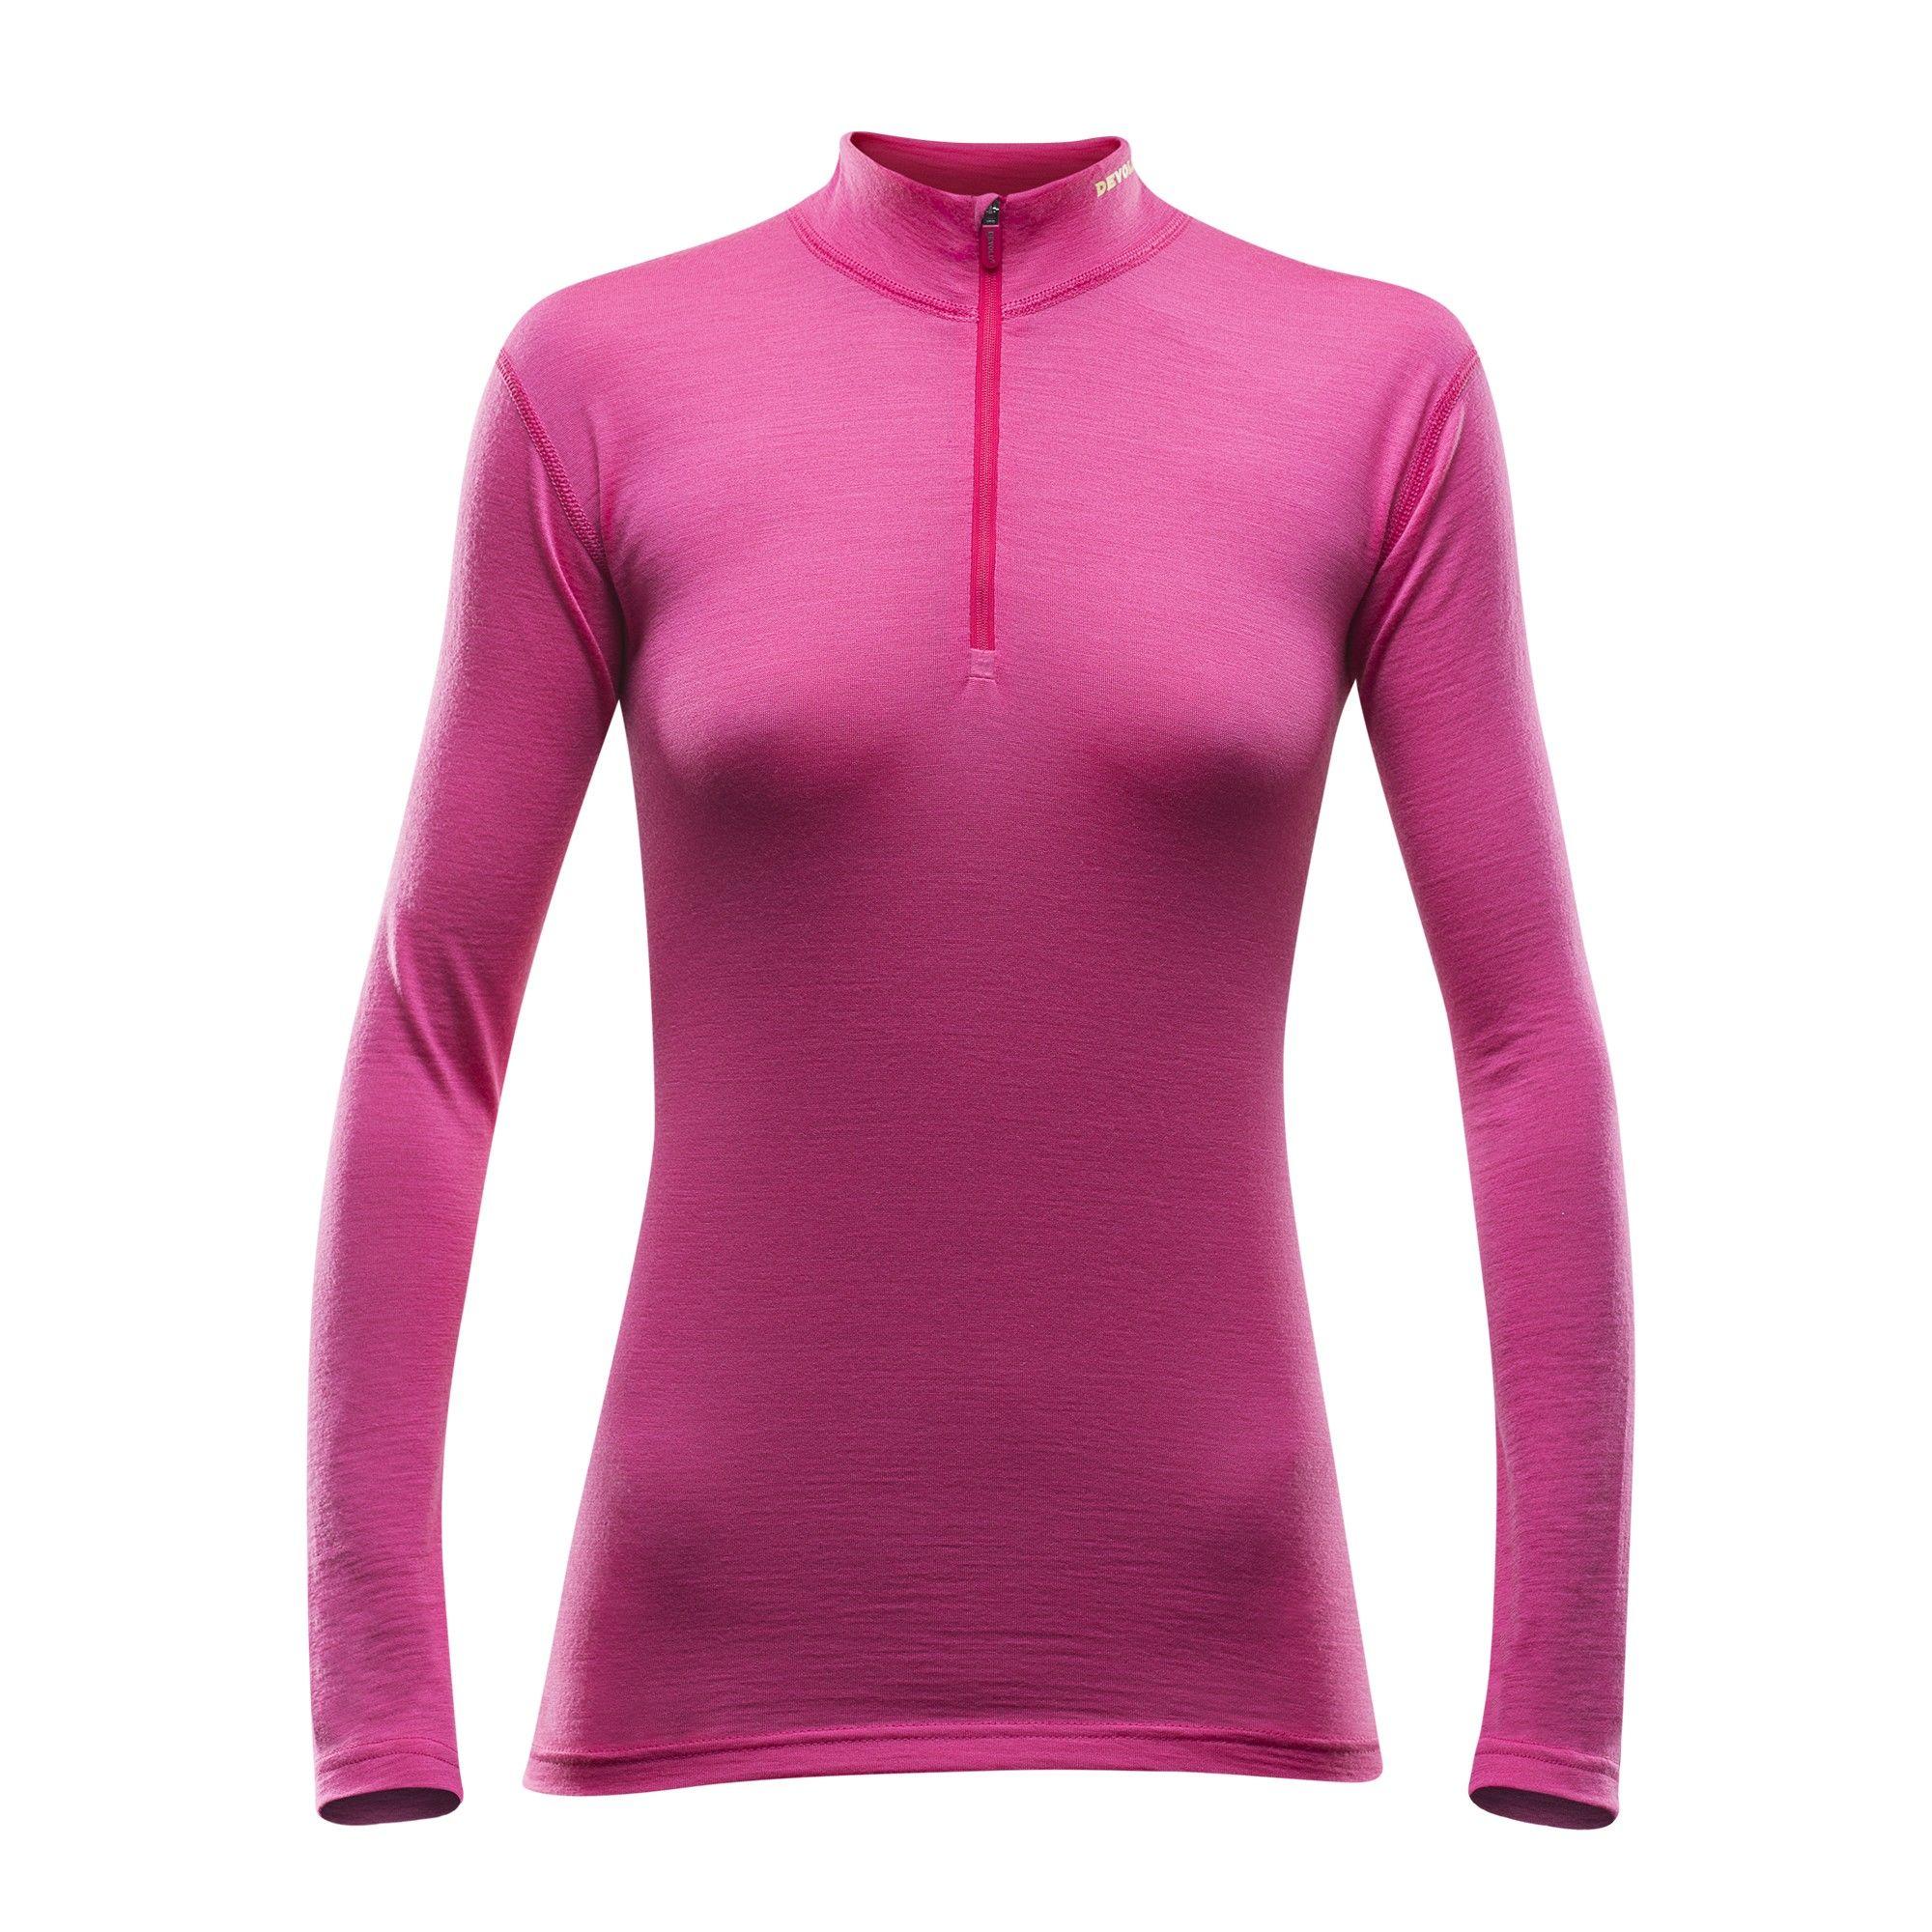 Devold Breeze Woman Half Zip Neck Pink, Female Merino Oberteil, M